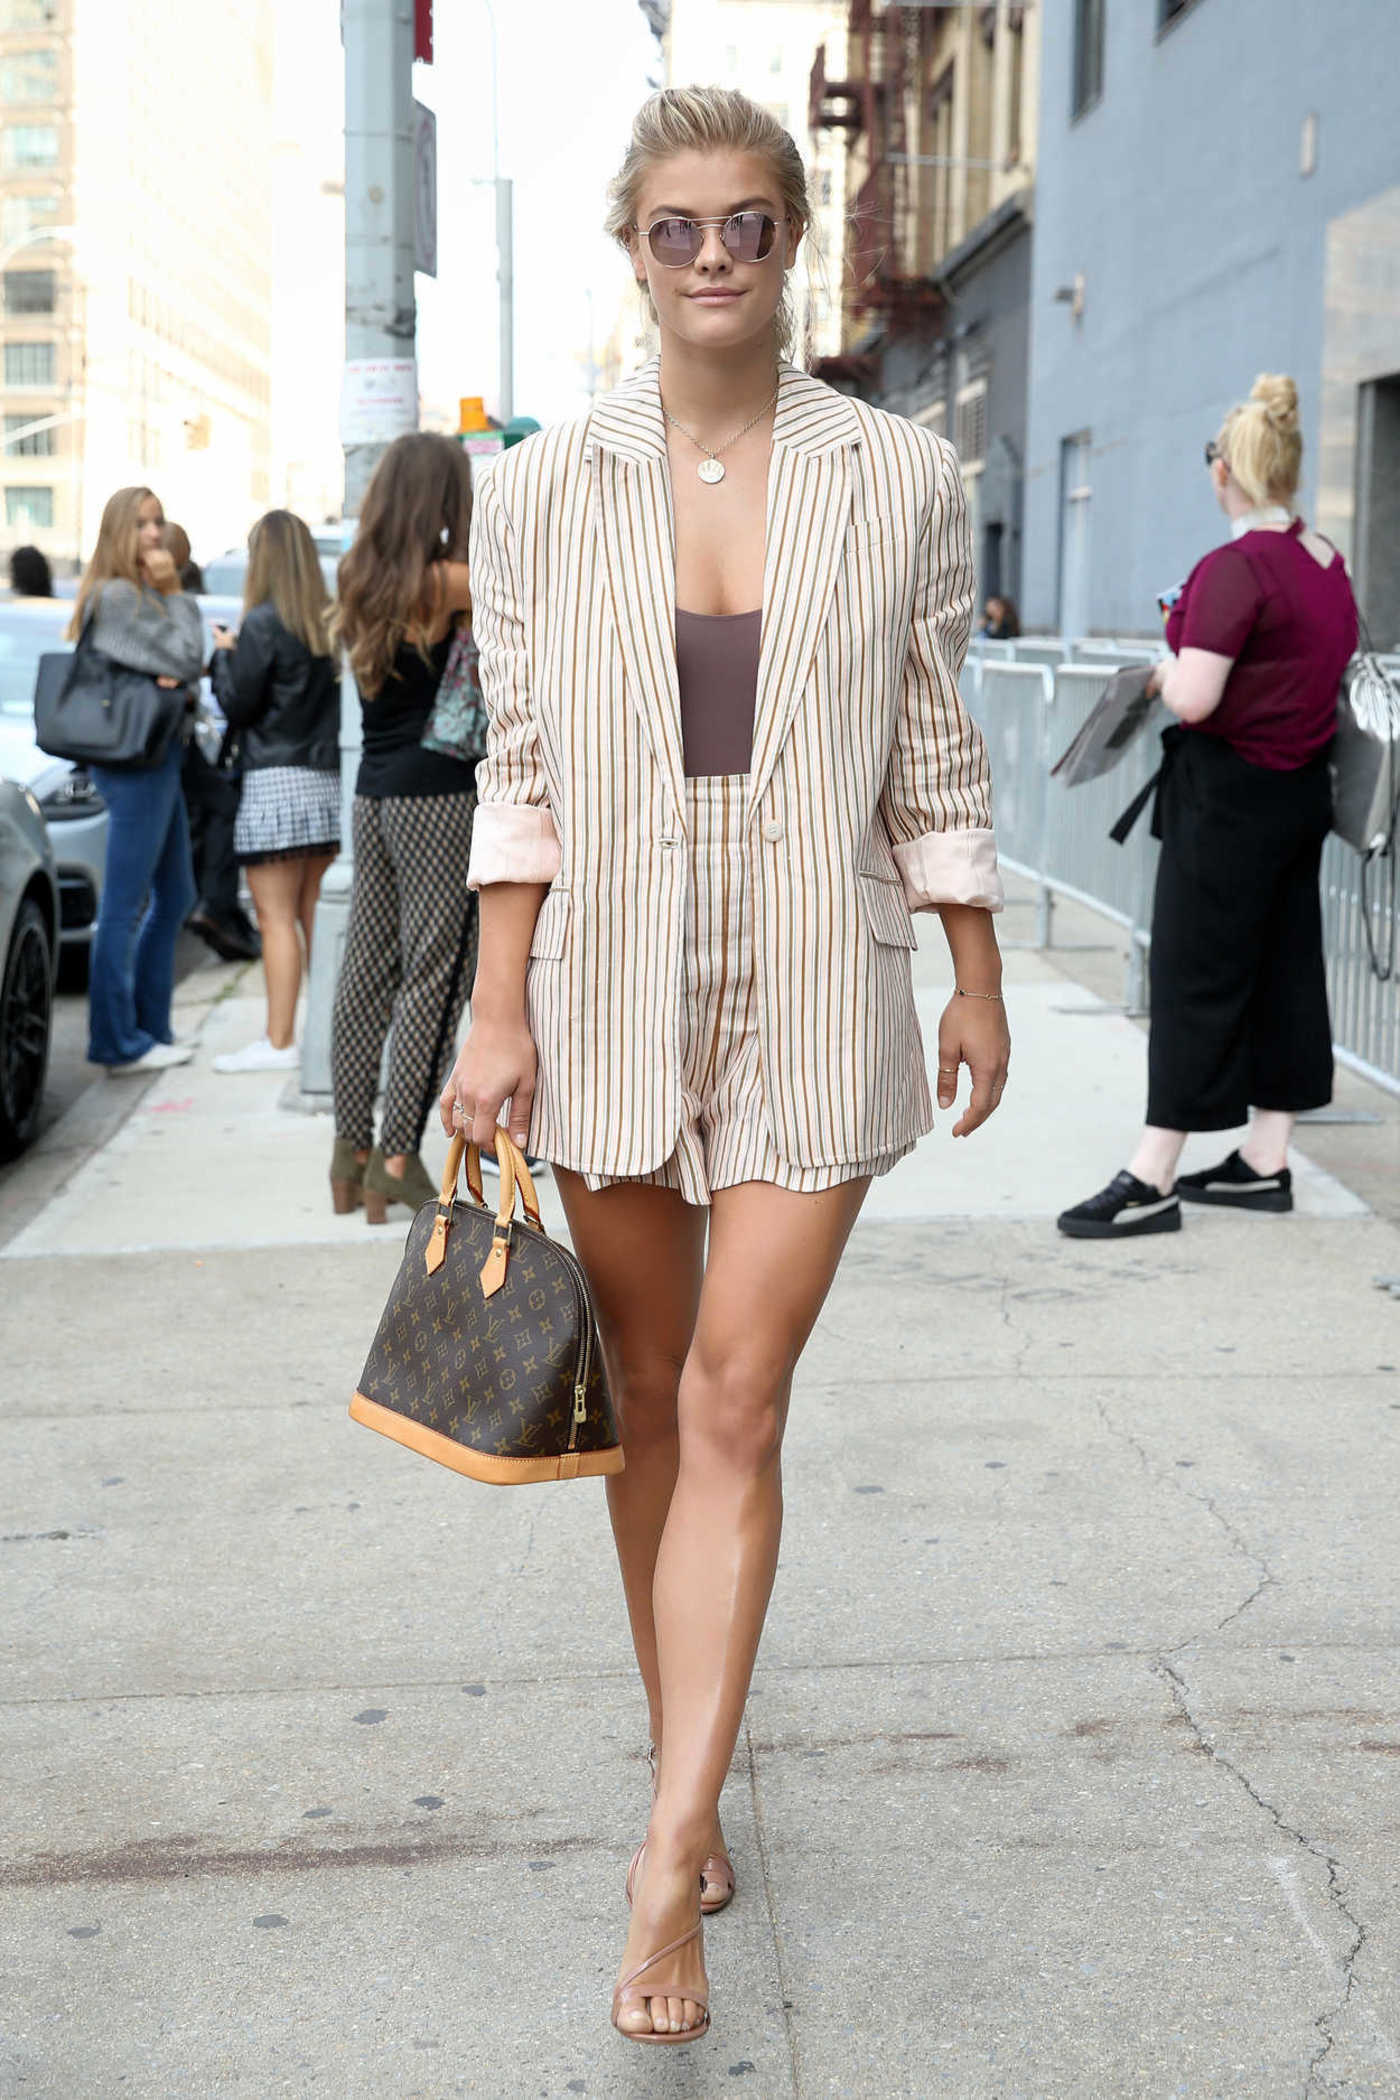 Nina Agdal Arrives at Spring Studios During New York Fashion Week 09/11/2017